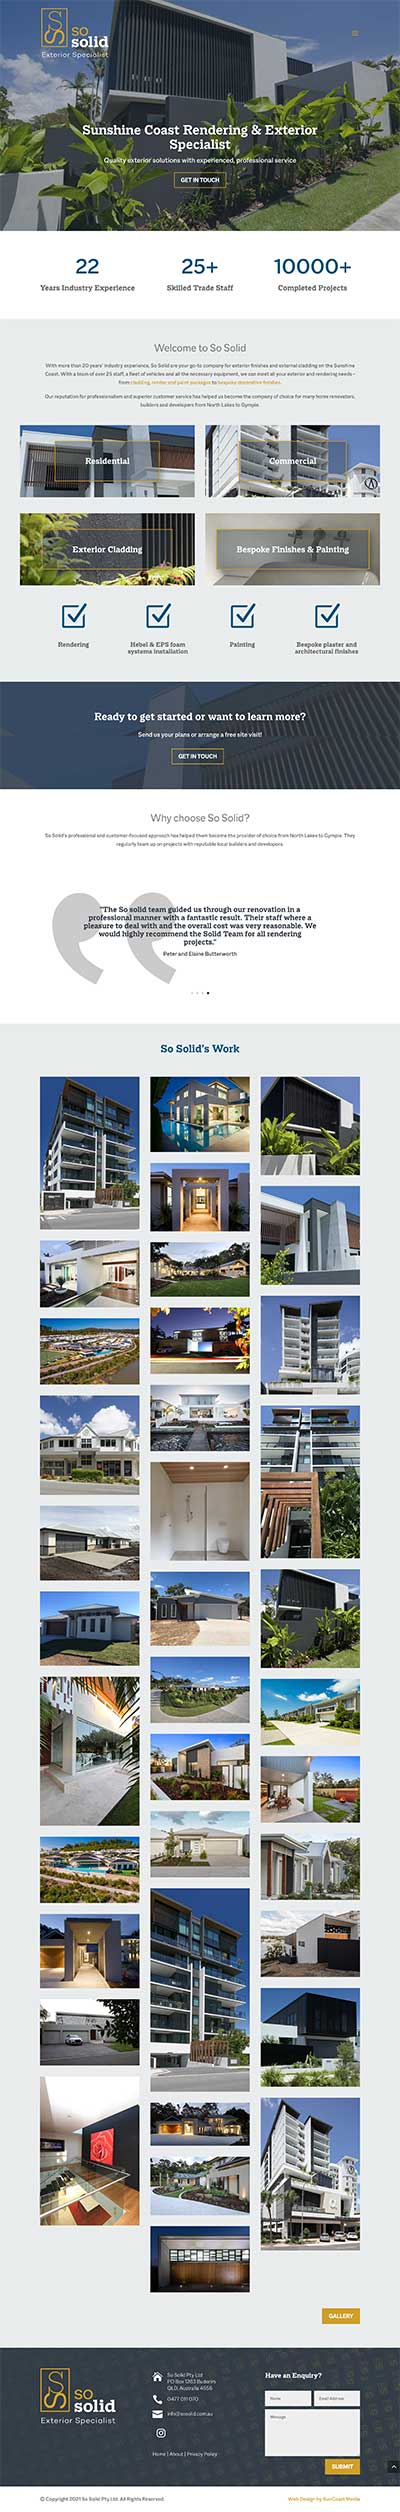 rendering-company-website-desing-sunshine-coast